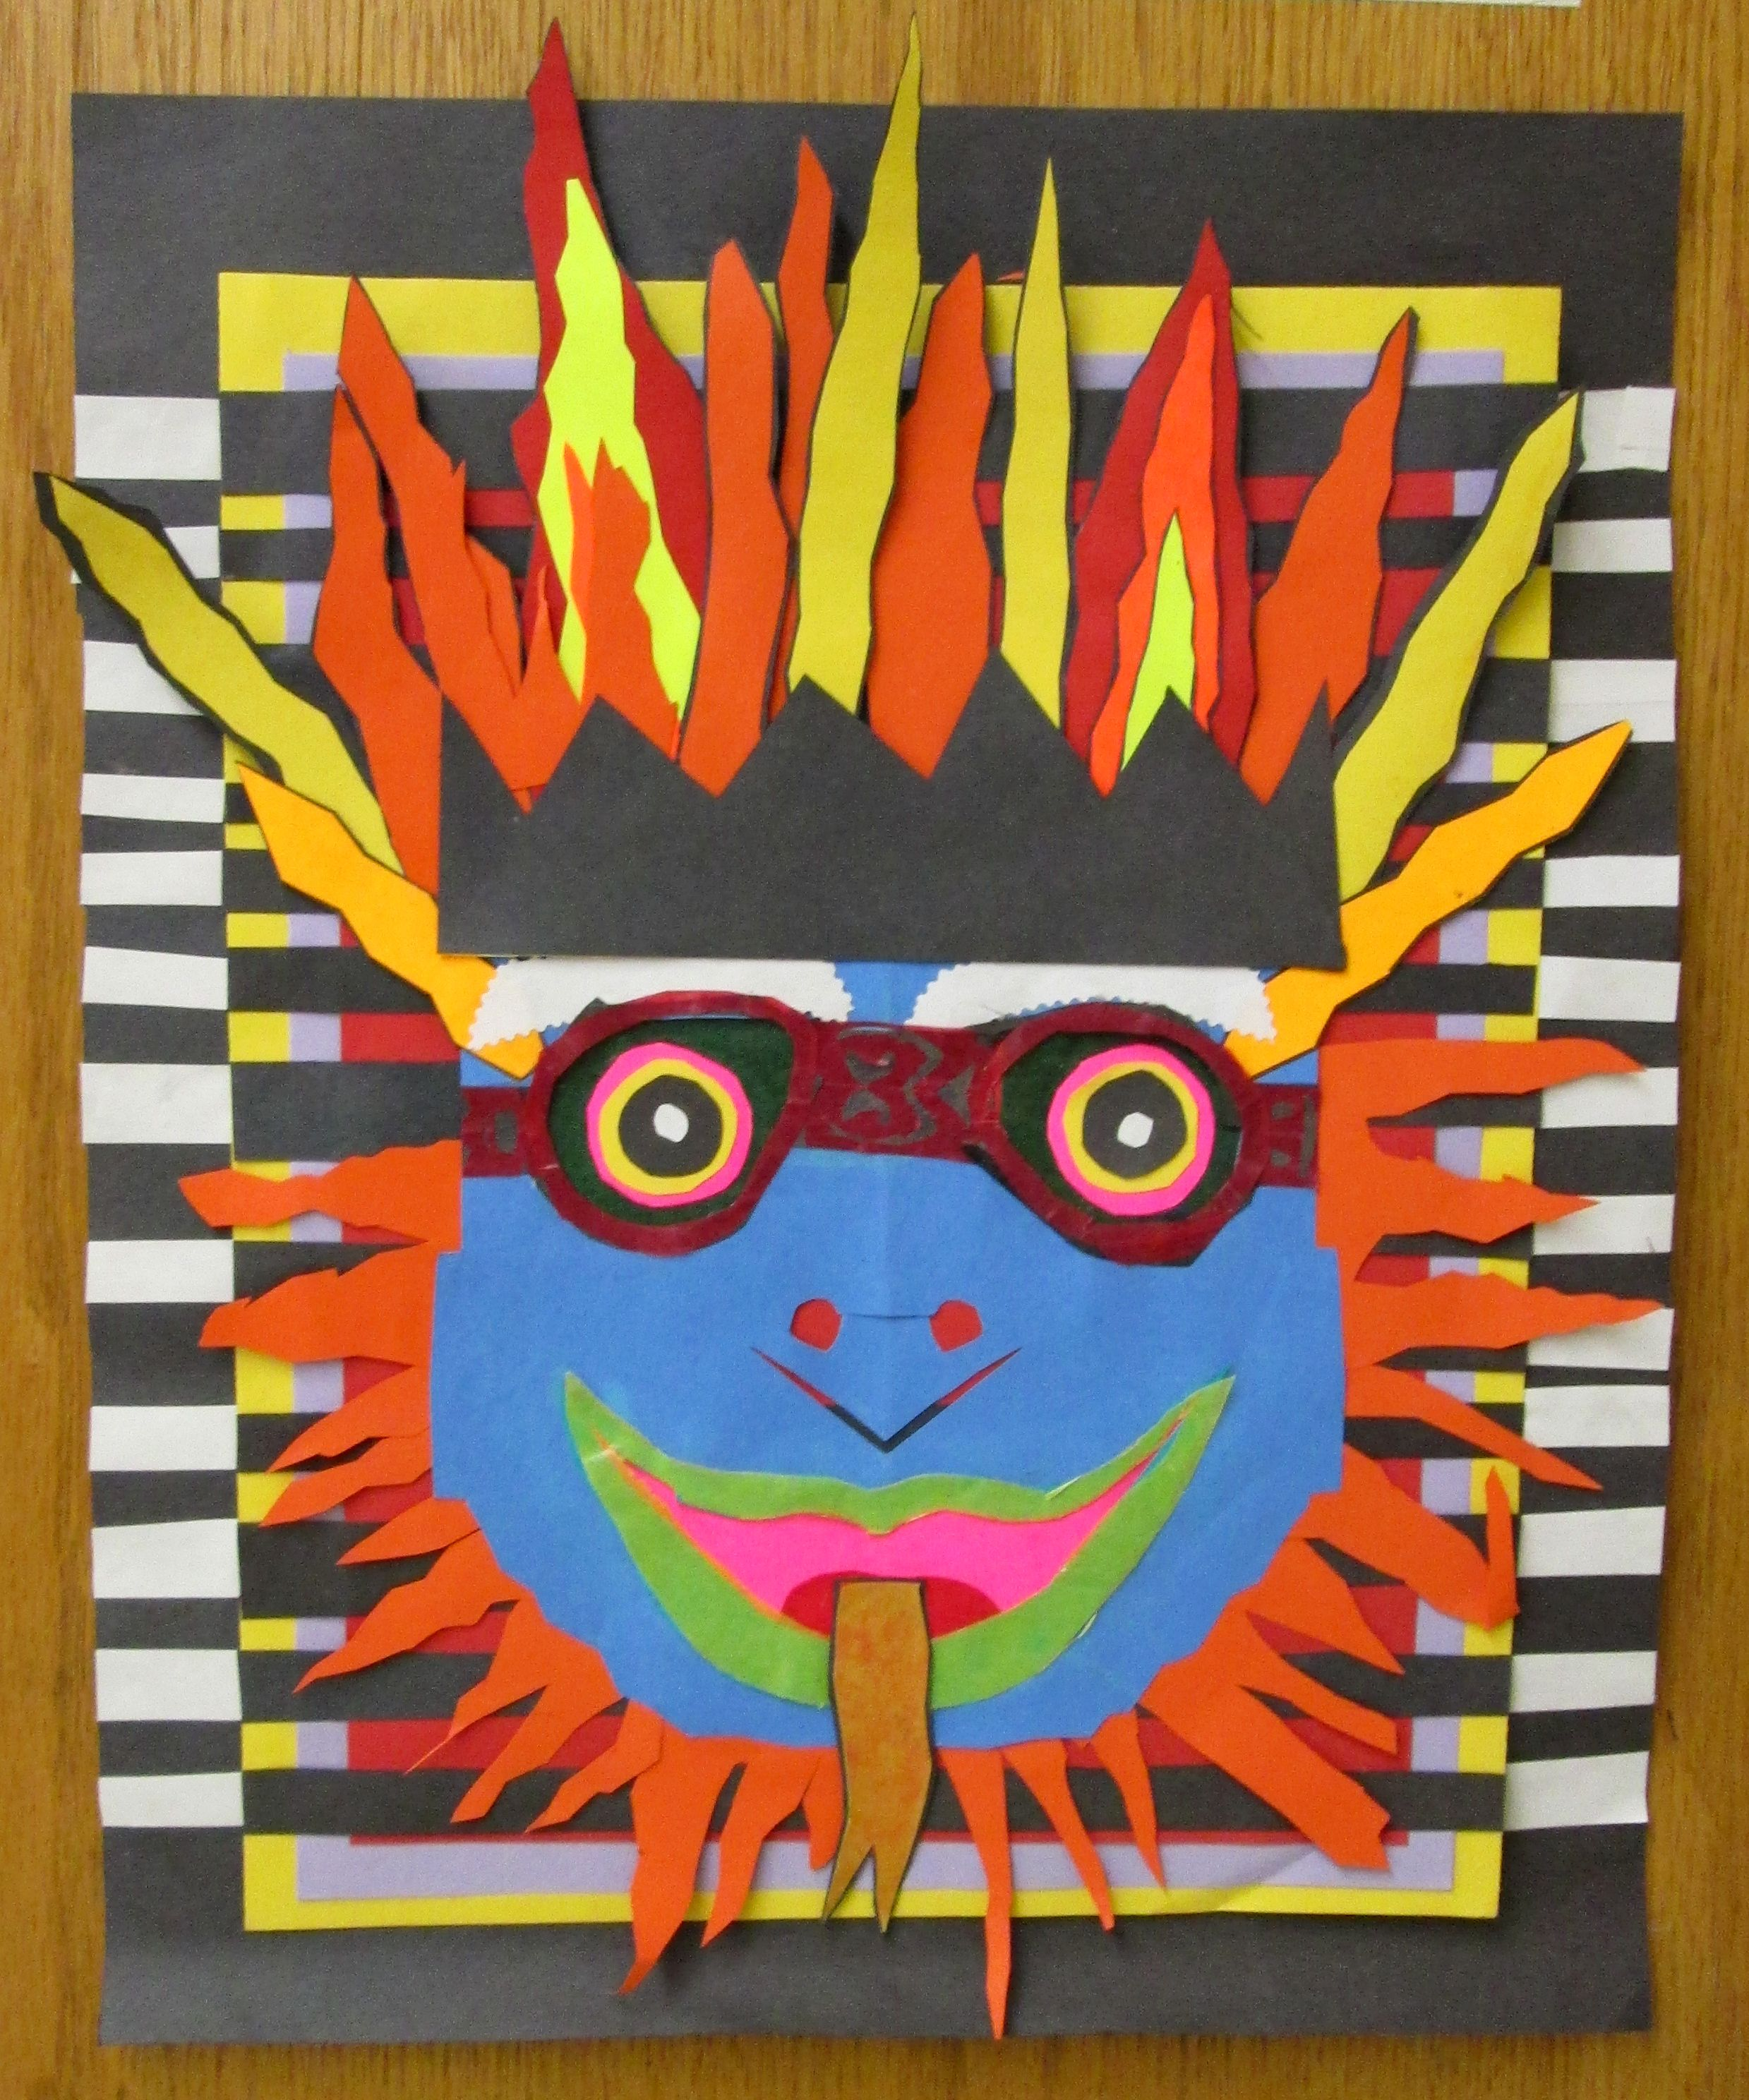 7th Grade Art, Balinese Mask, Rye Middle School, 2011-2012 | Student